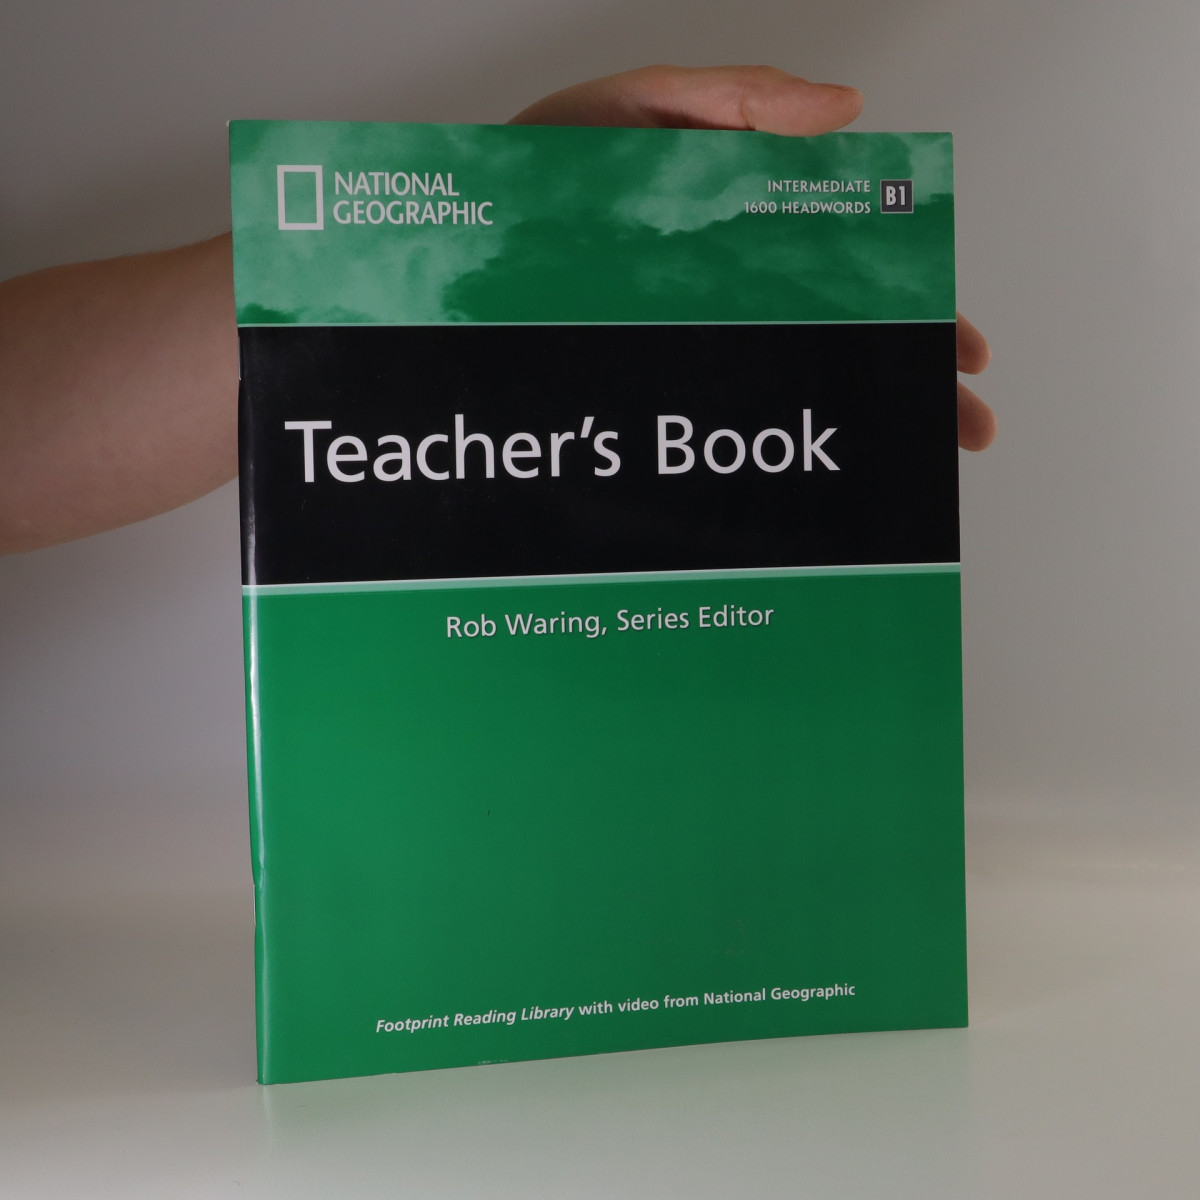 antikvární kniha Footprint Reading Library Teacher's Book. Intermediate. 1600 Headwoords. B1, neuveden